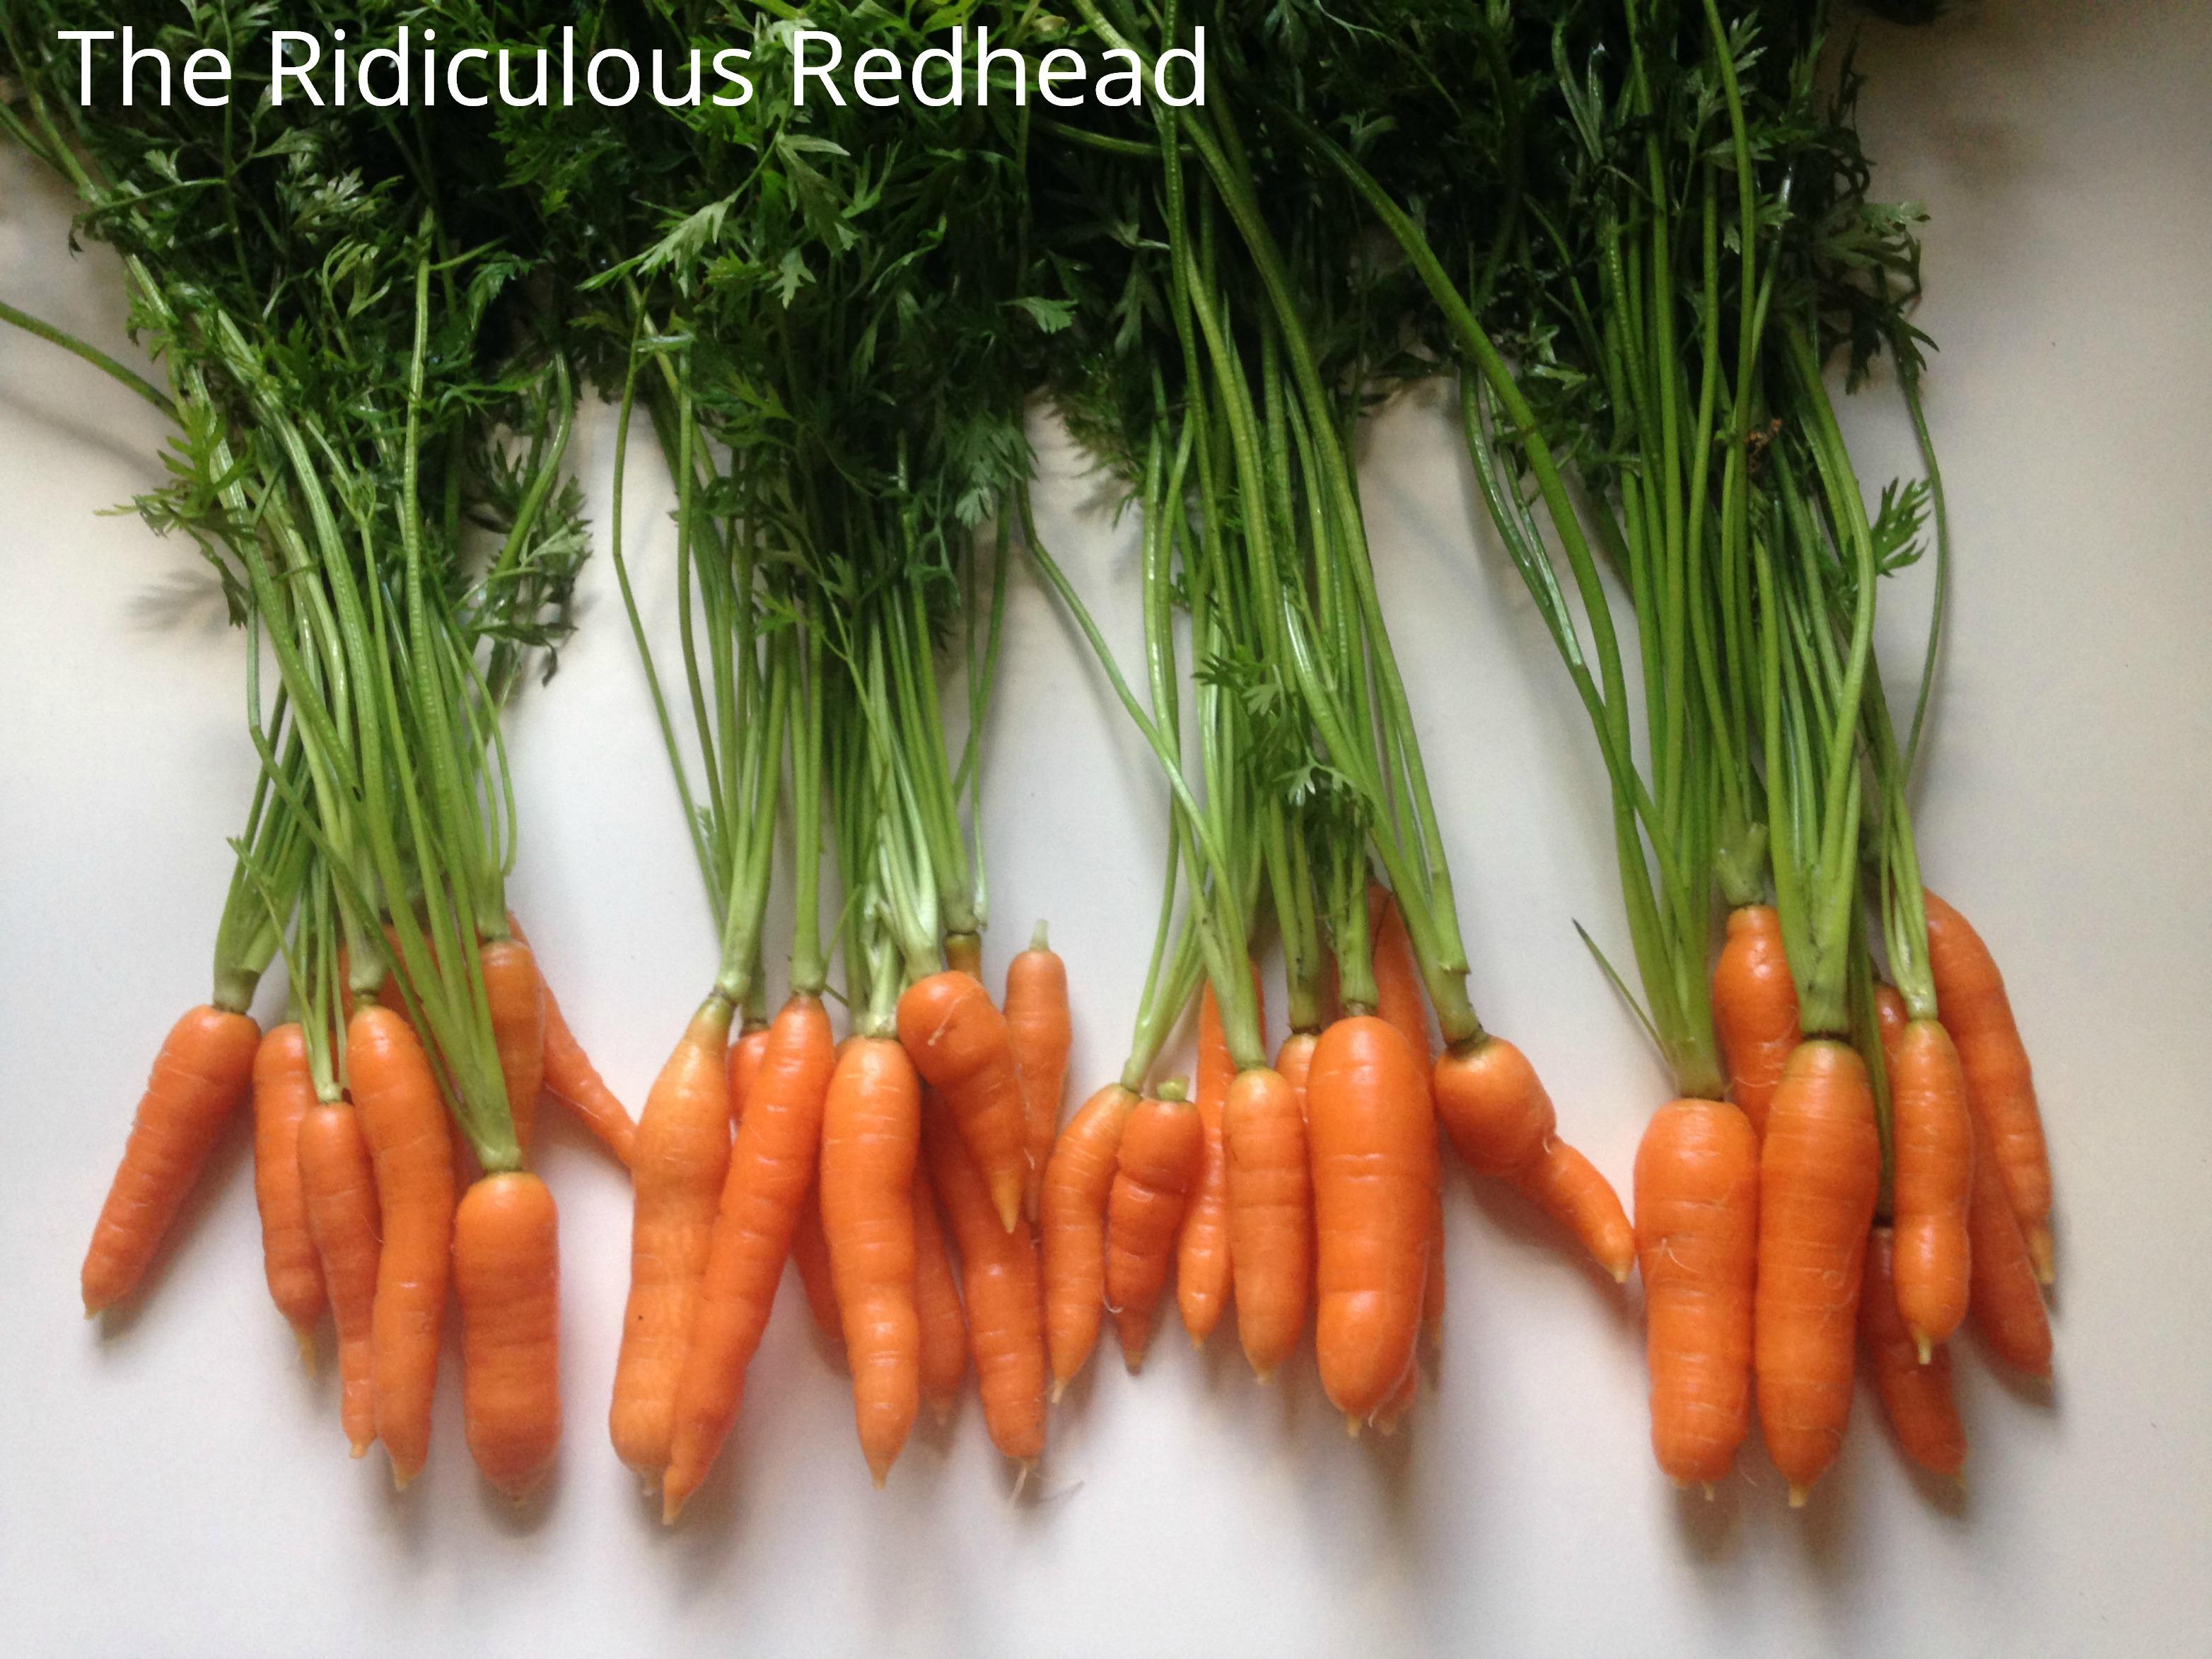 Ridiculous Redhead Carrots